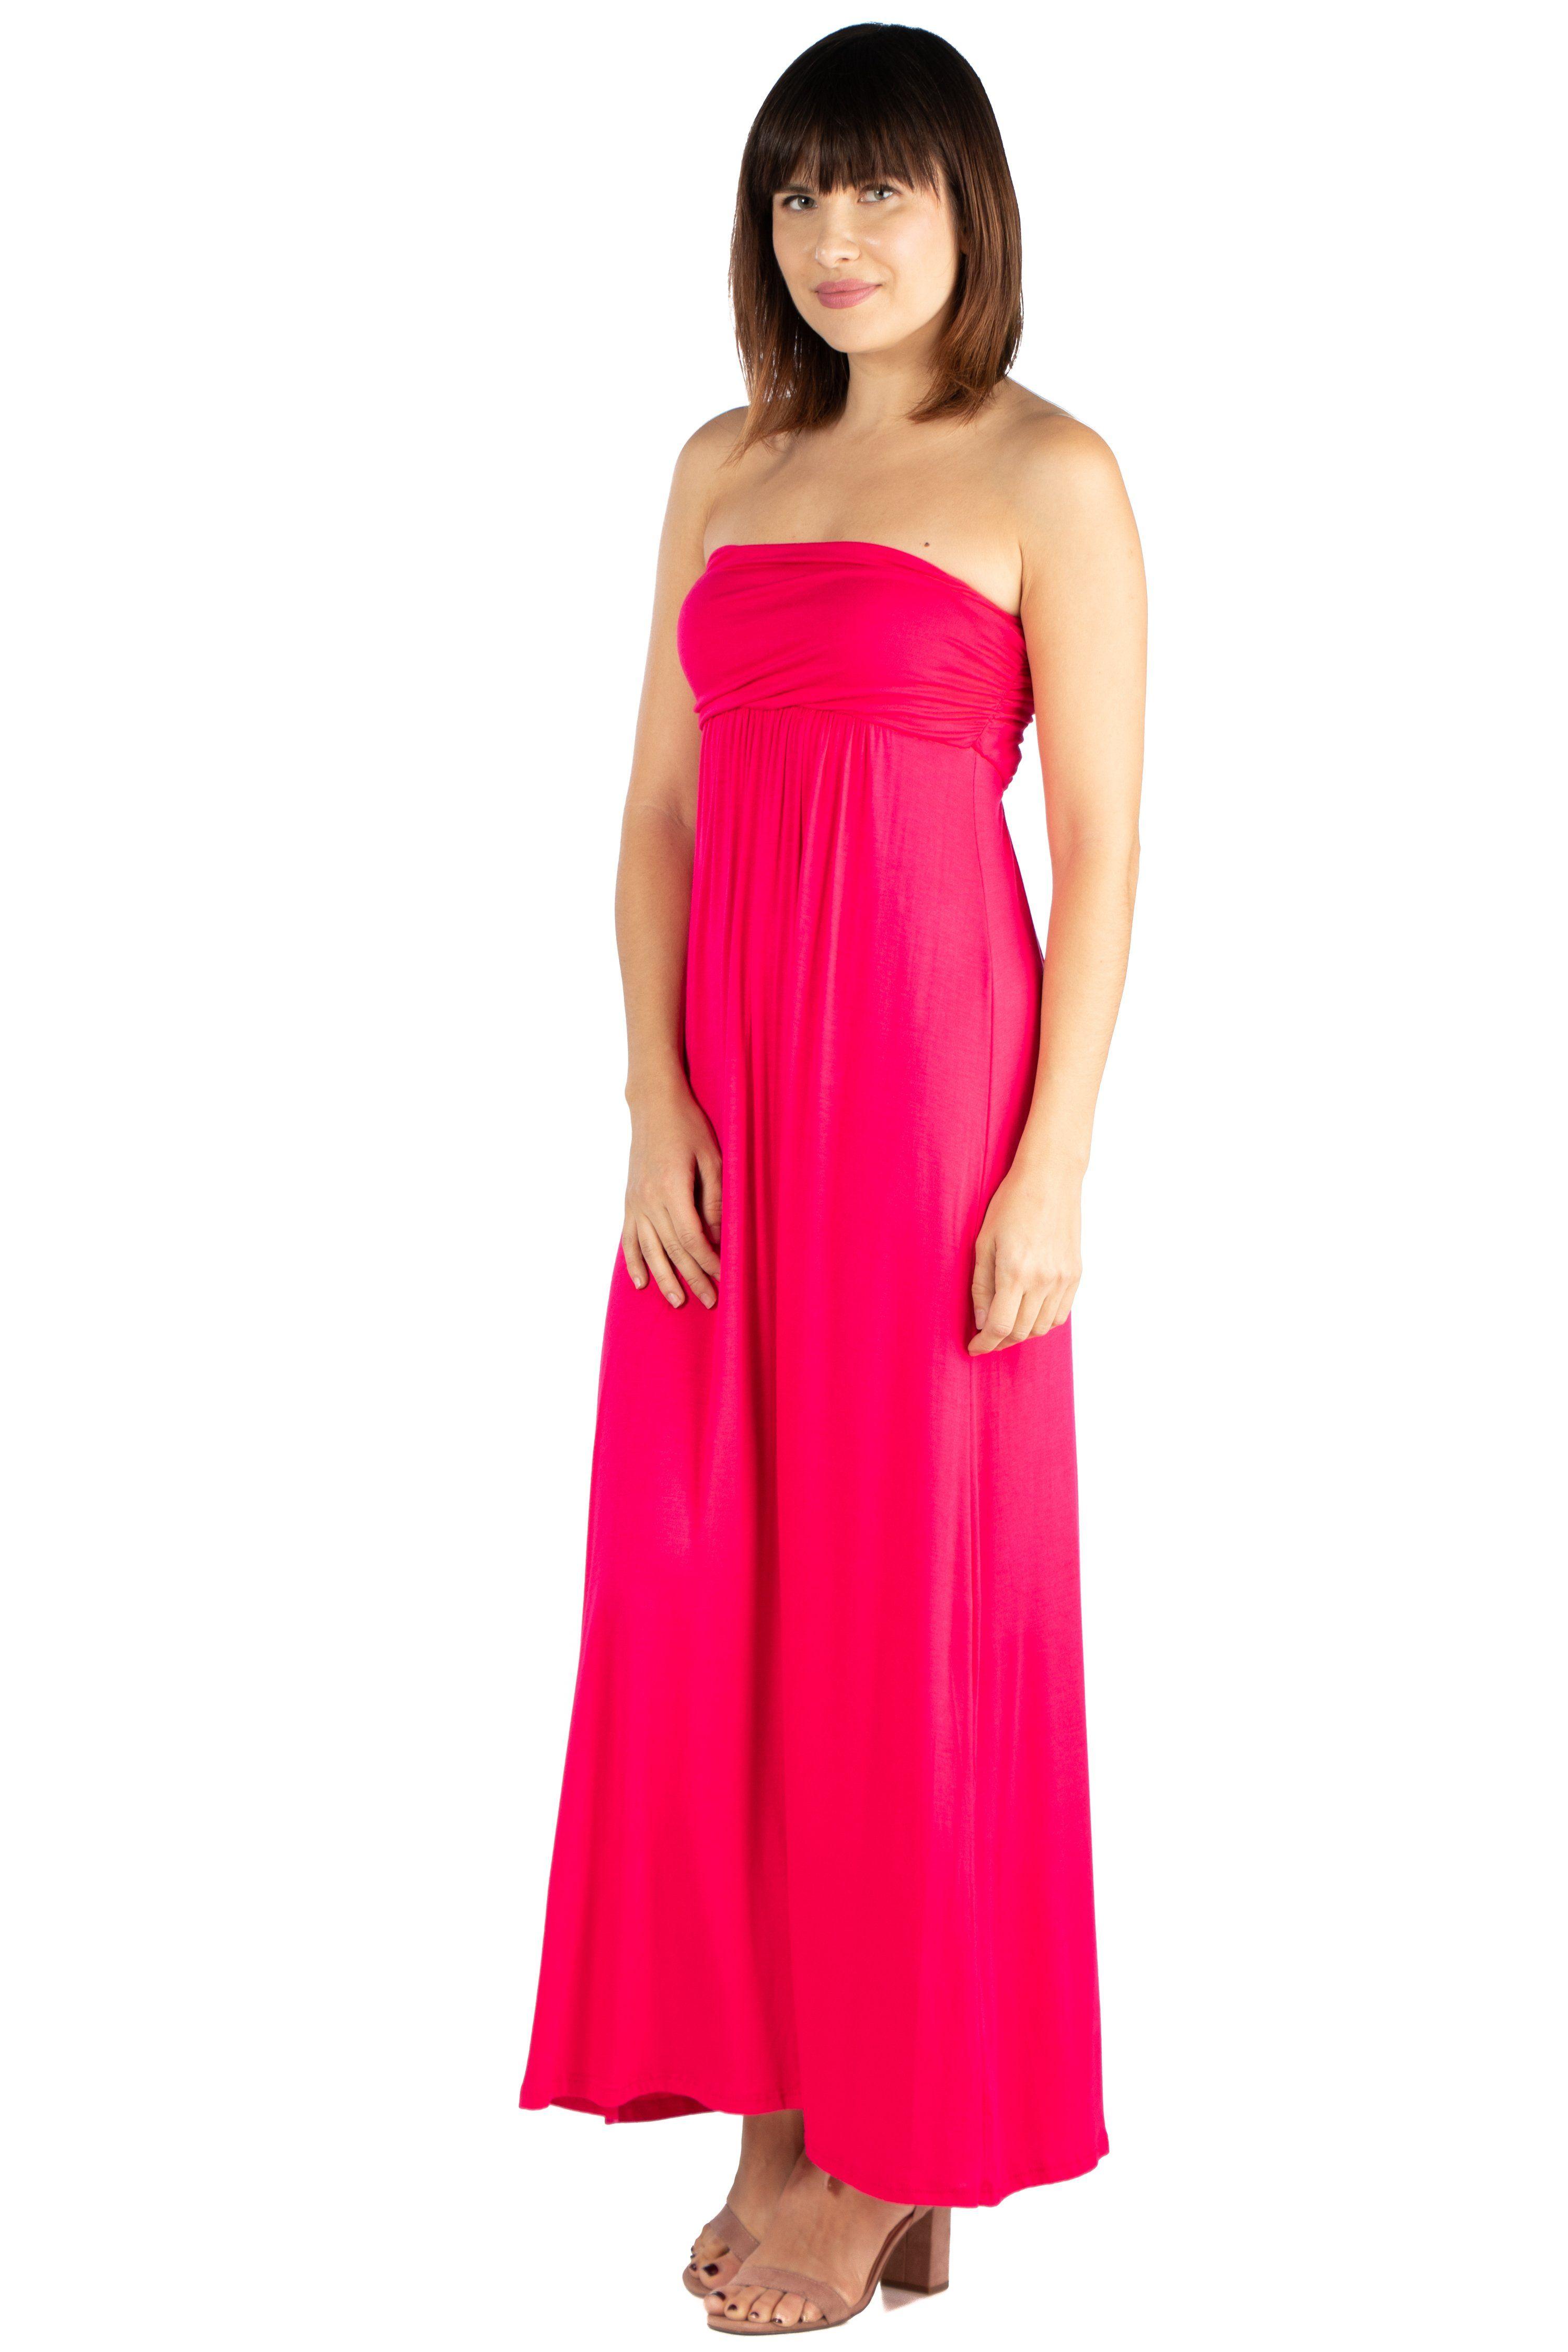 4ef9fe064a72 Women's Solid Color Empire Waist Strapless Maxi Dress Strapless Maxi Dress  This strapless maxi dress is